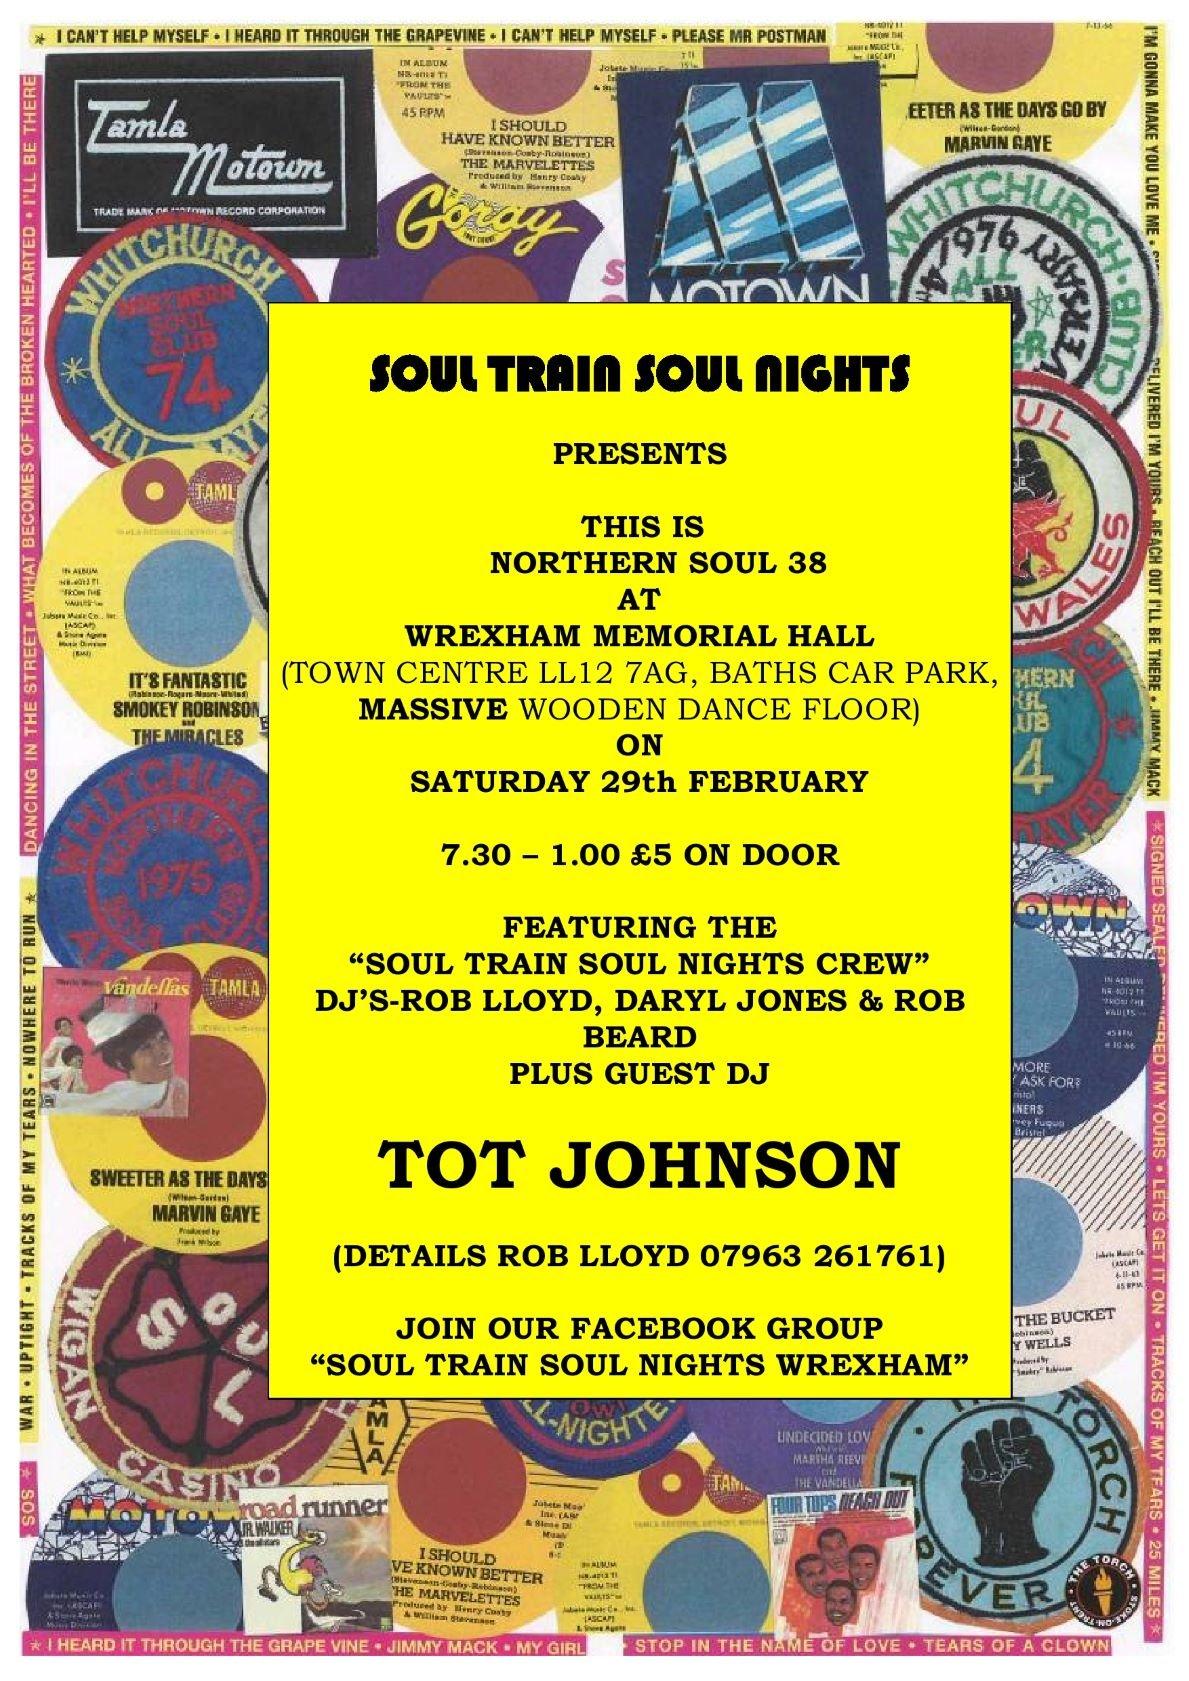 Wrexham Memo  Tot Johnson  Guest Dj flyer